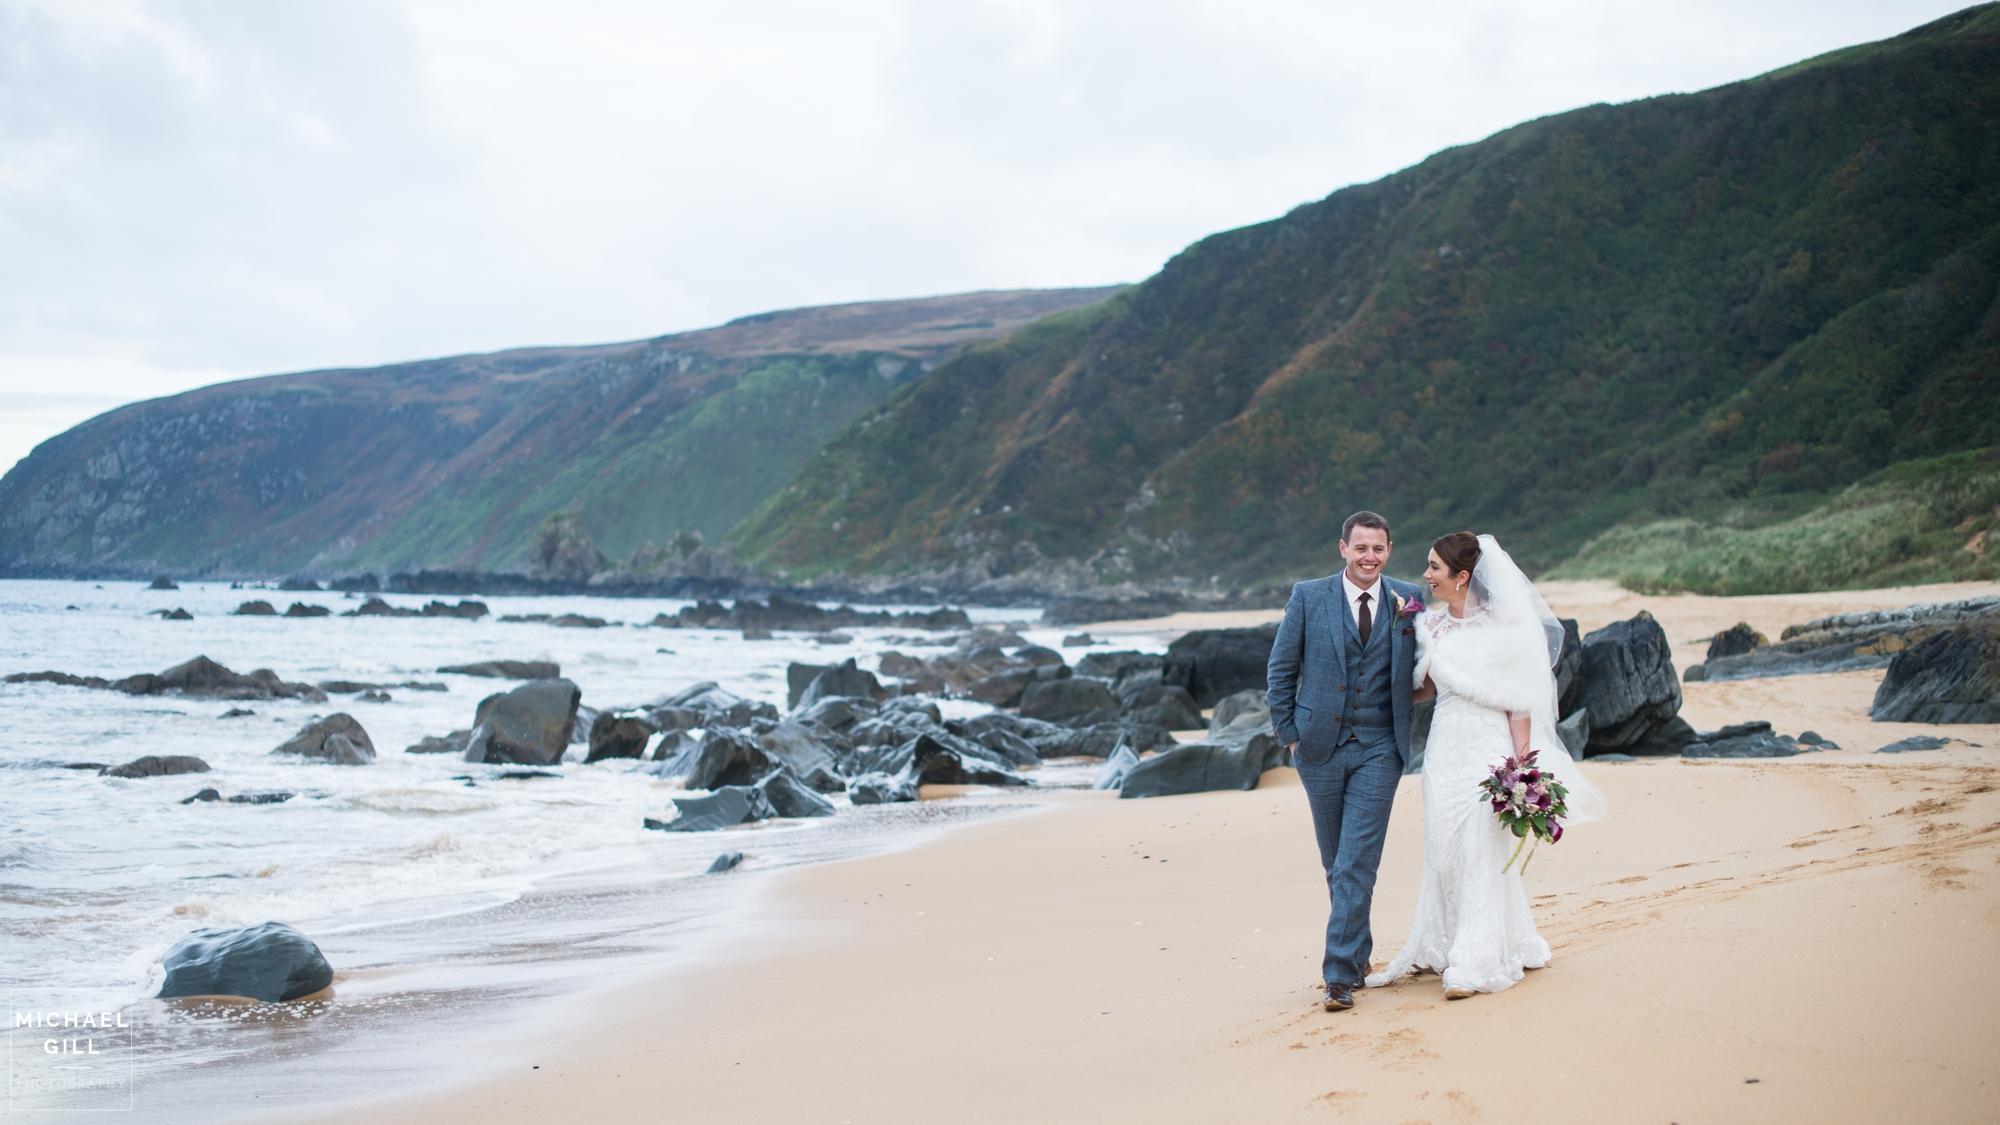 Michael_Gill_Photography_Kinnego_Redcastle_Hotel_Wedding8 (1).jpg